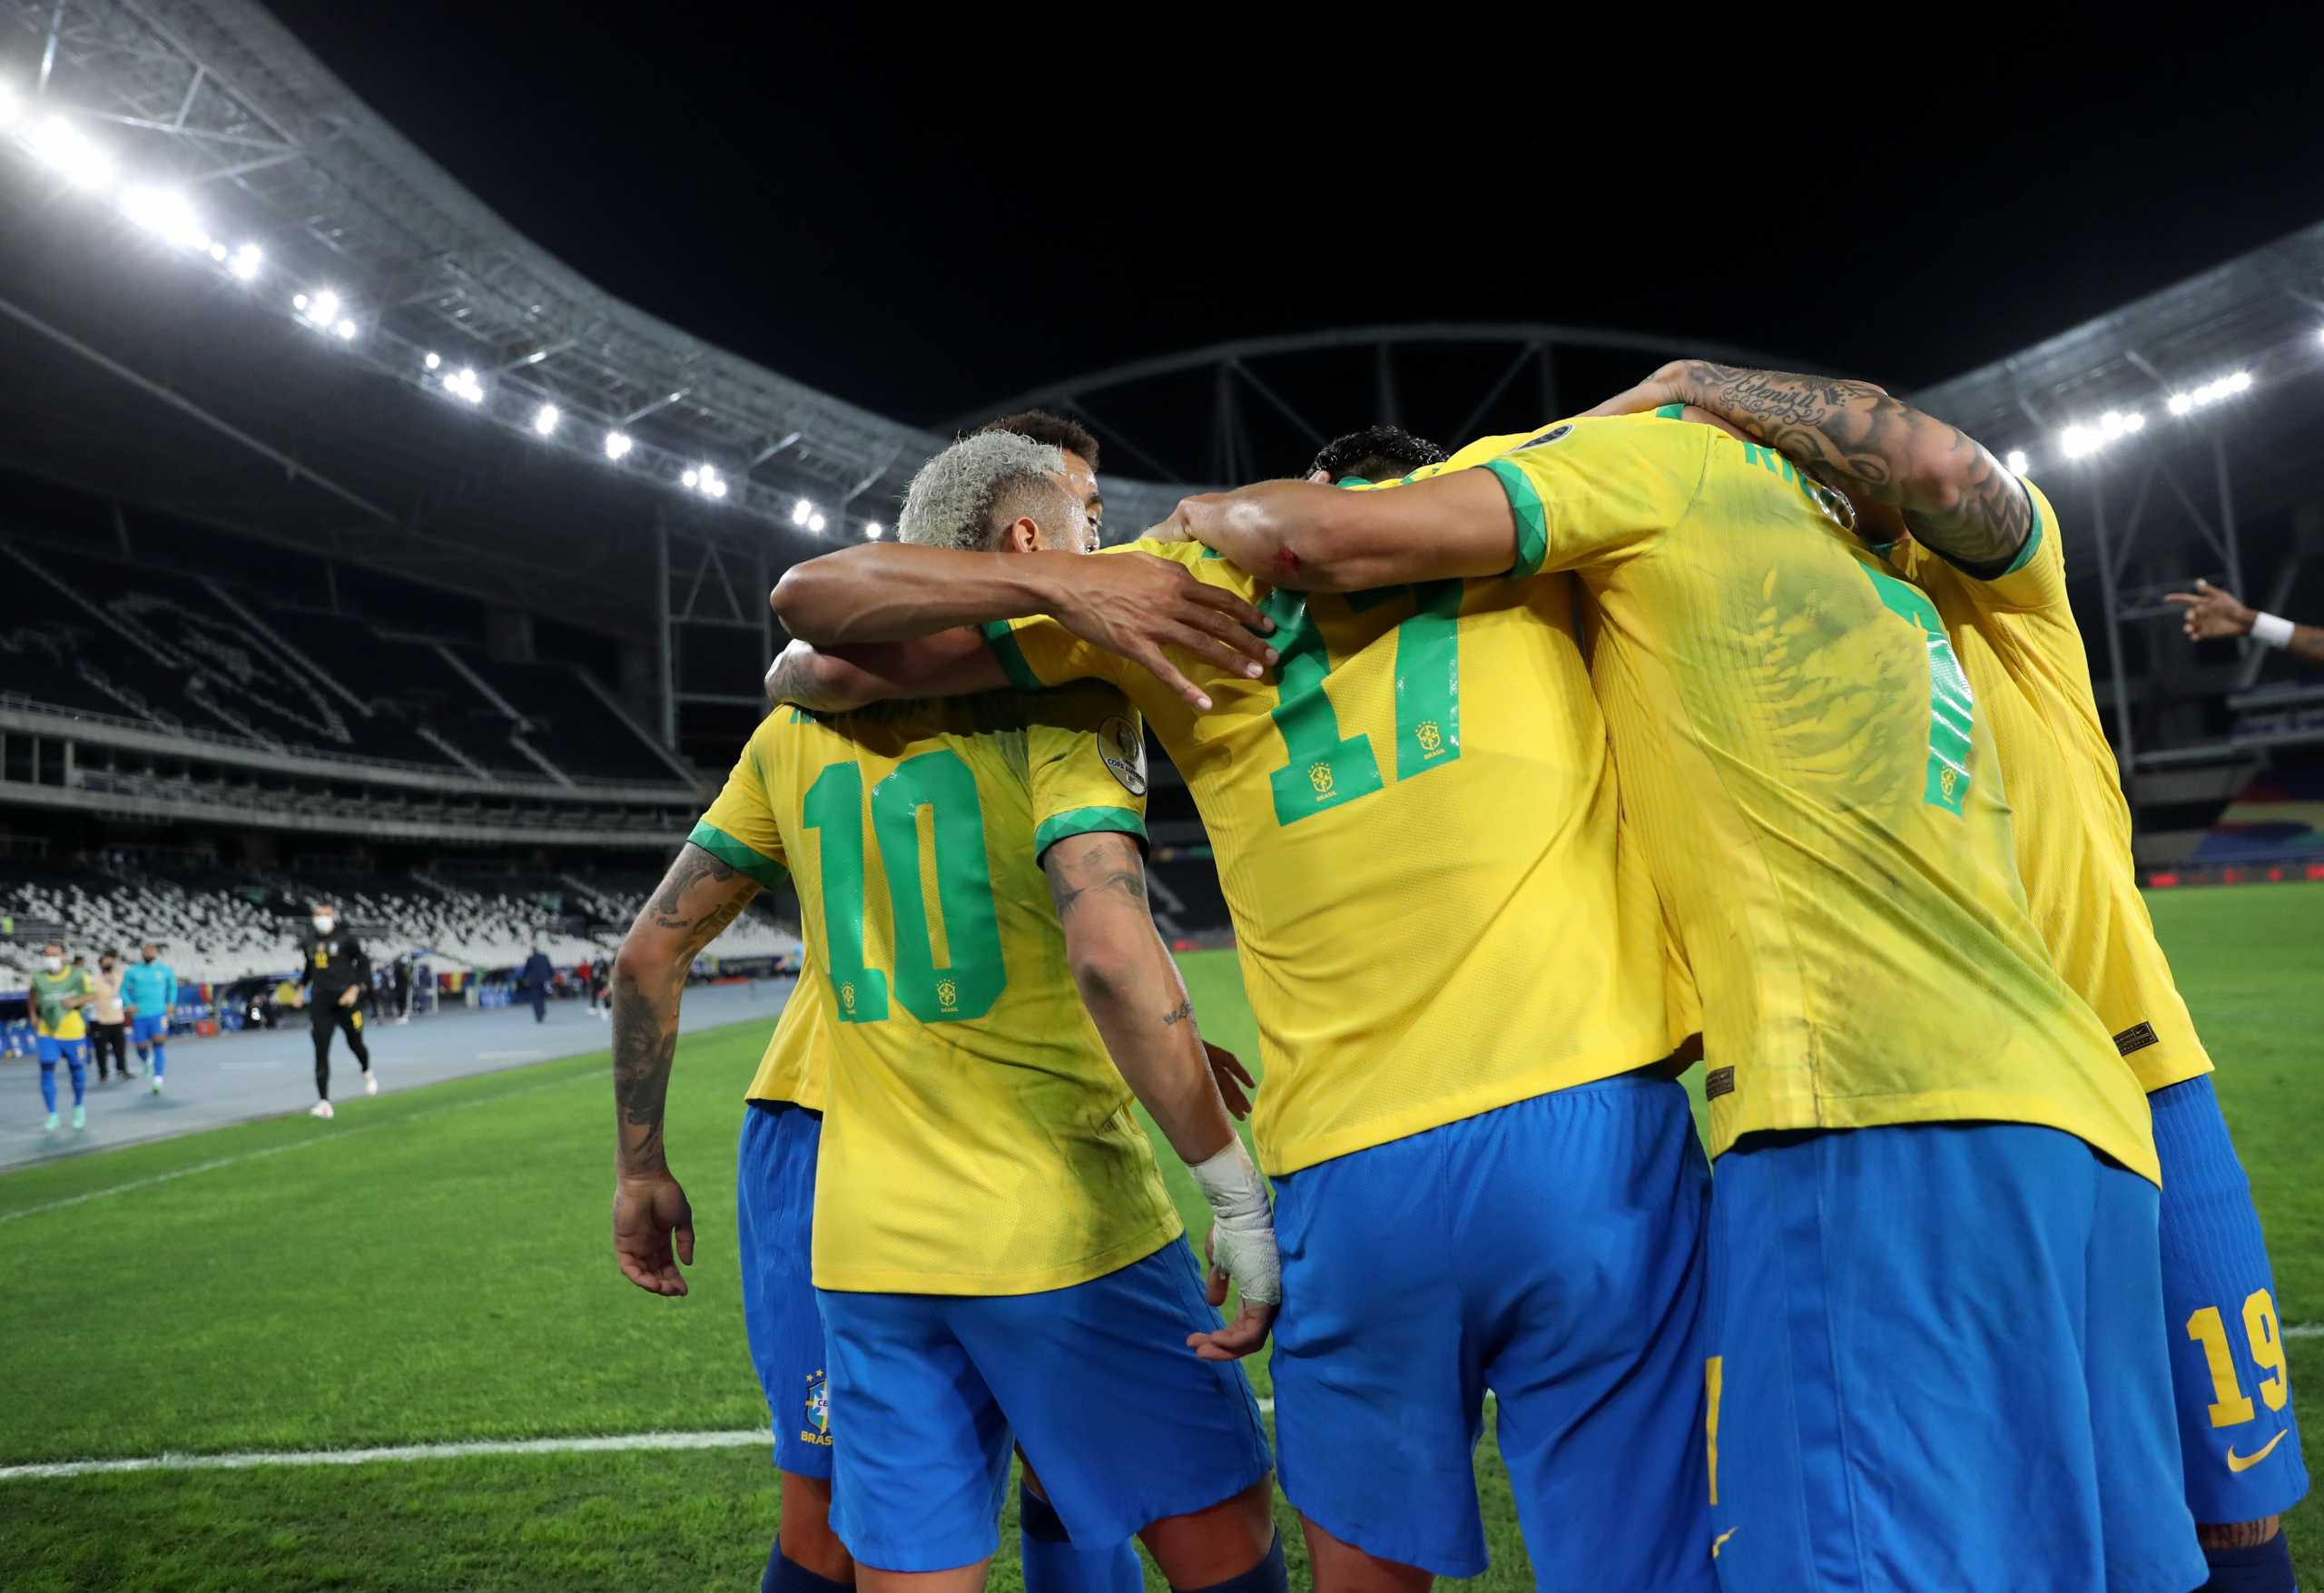 Copa America: Στον τελικό η Βραζιλία που «λύγισε» το μαχητικό Περού